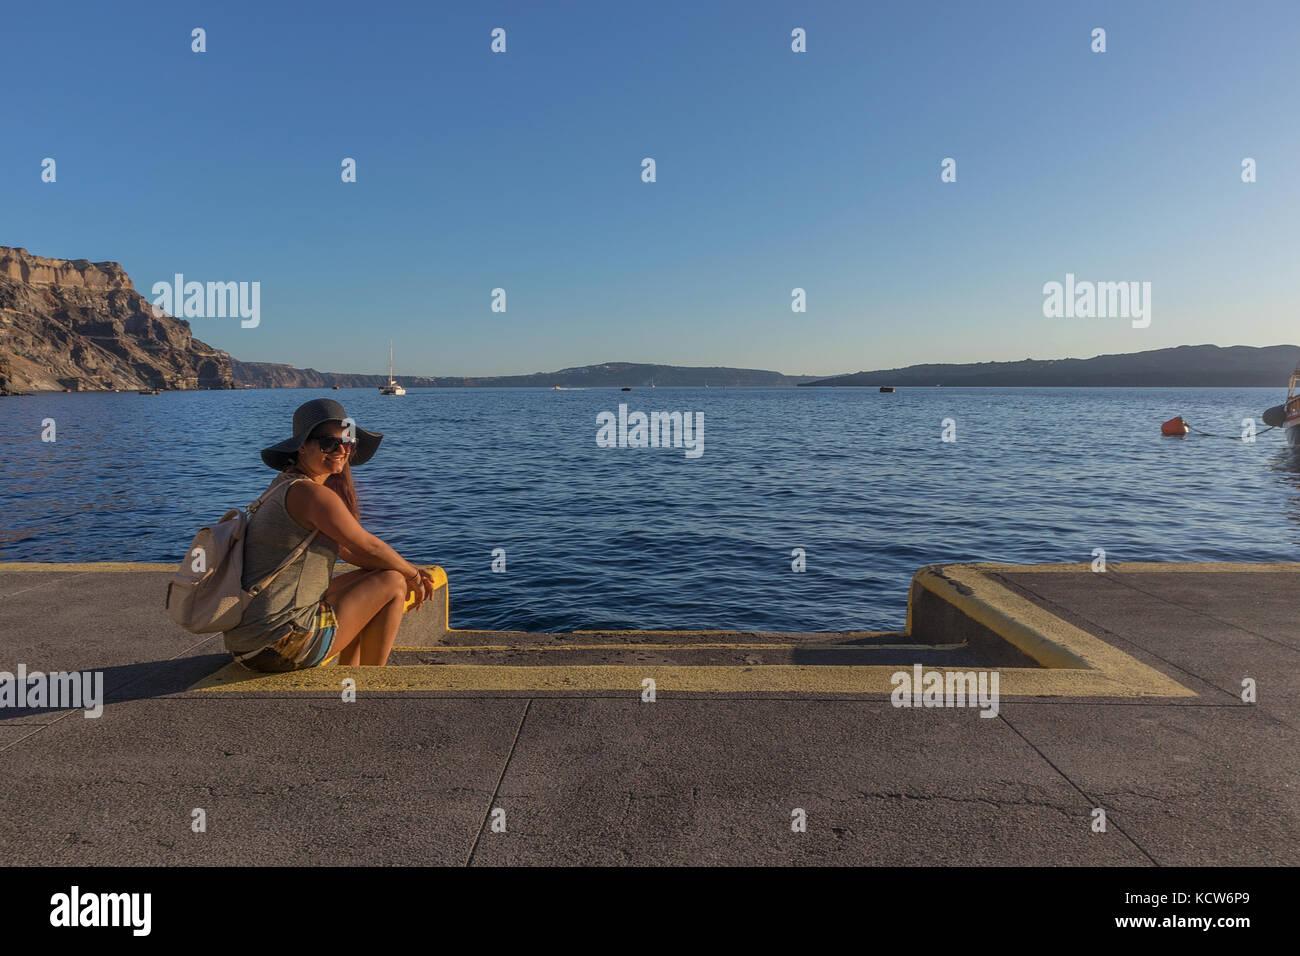 SANTORINI/GREECE 05 SEP 2017 - Young girl sitting in the port of Fira. Santorini, Greece. - Stock Image